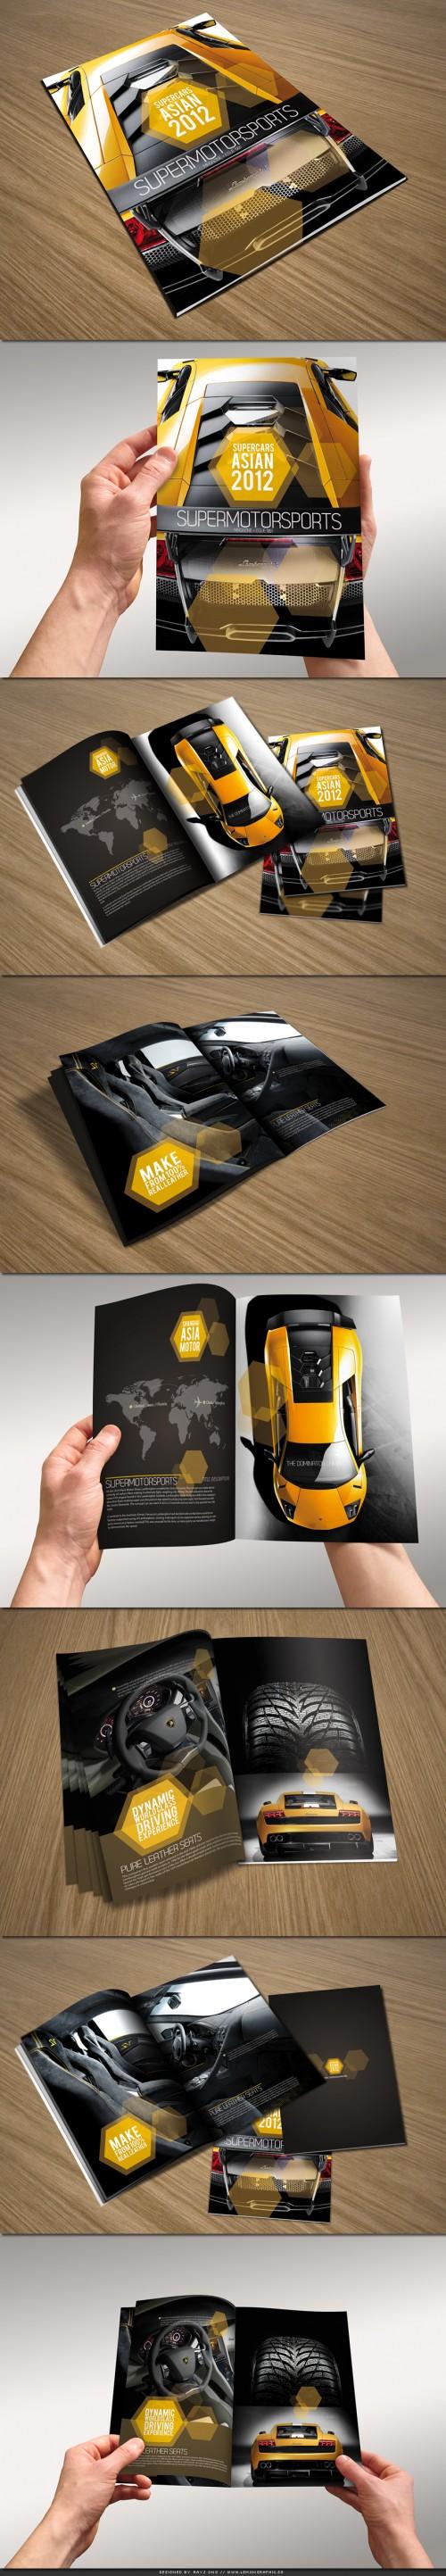 3_Supercars Asia 2012